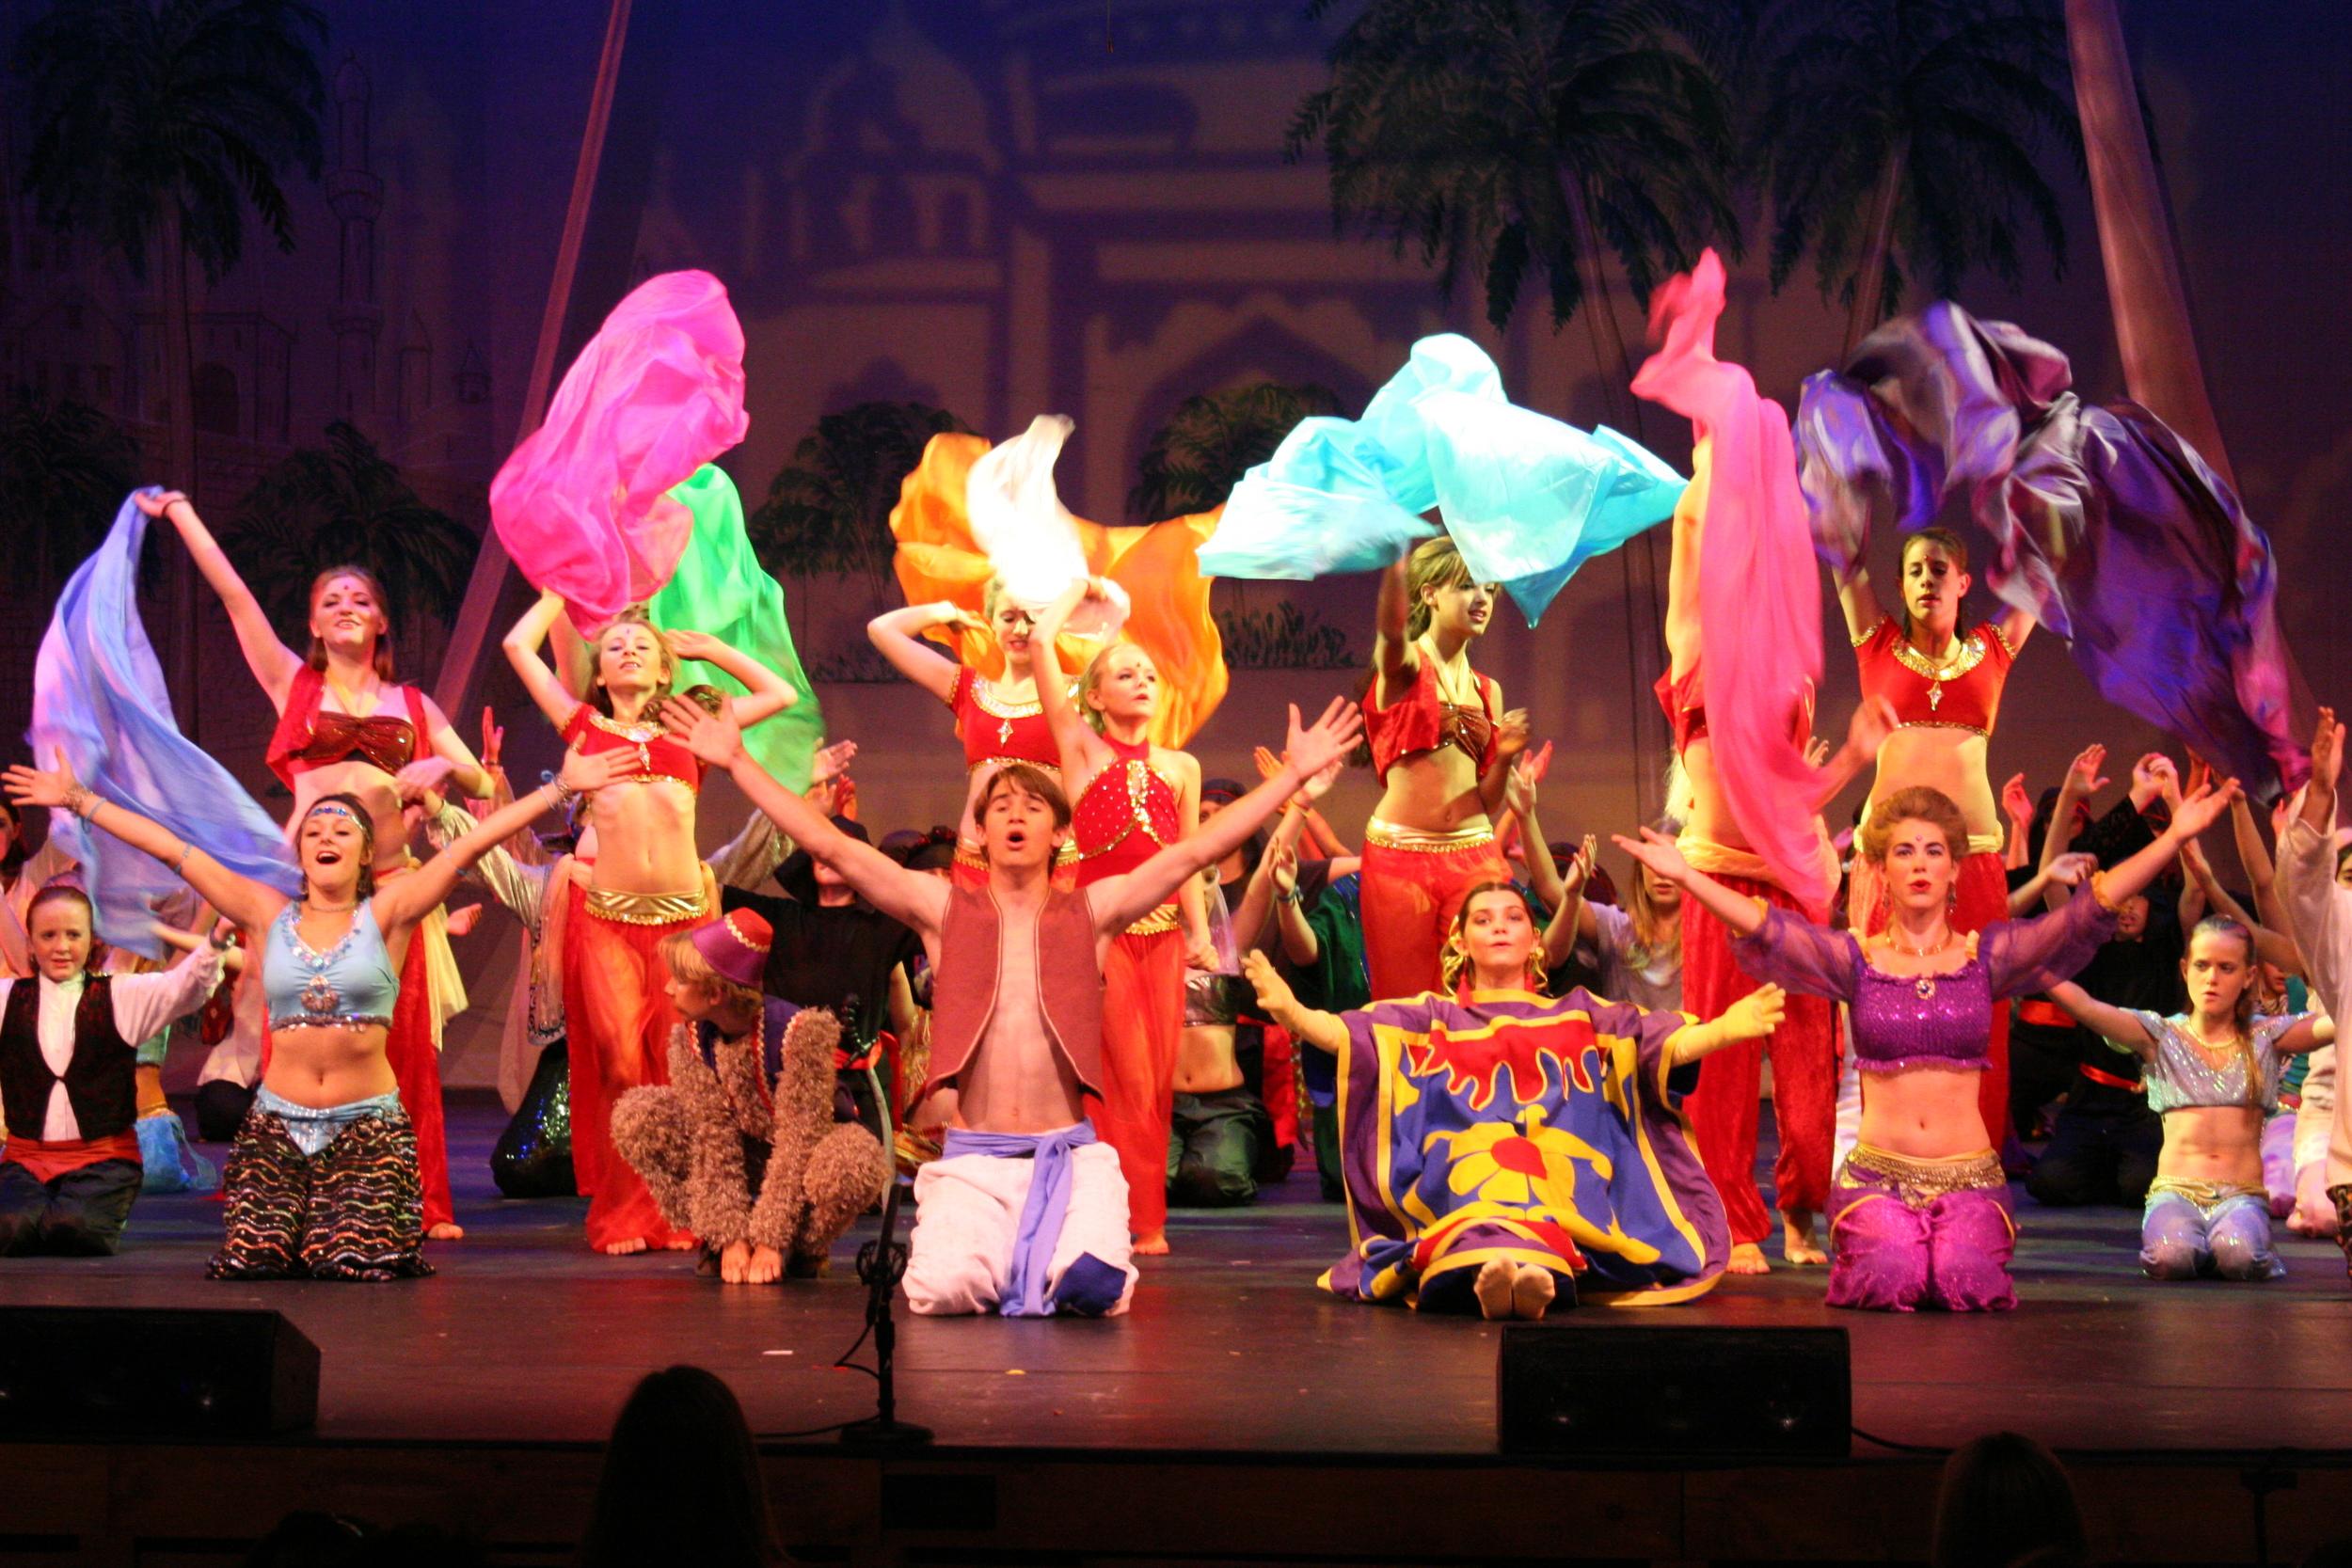 '06 Jackson to Aladdin 1087.c.jpg